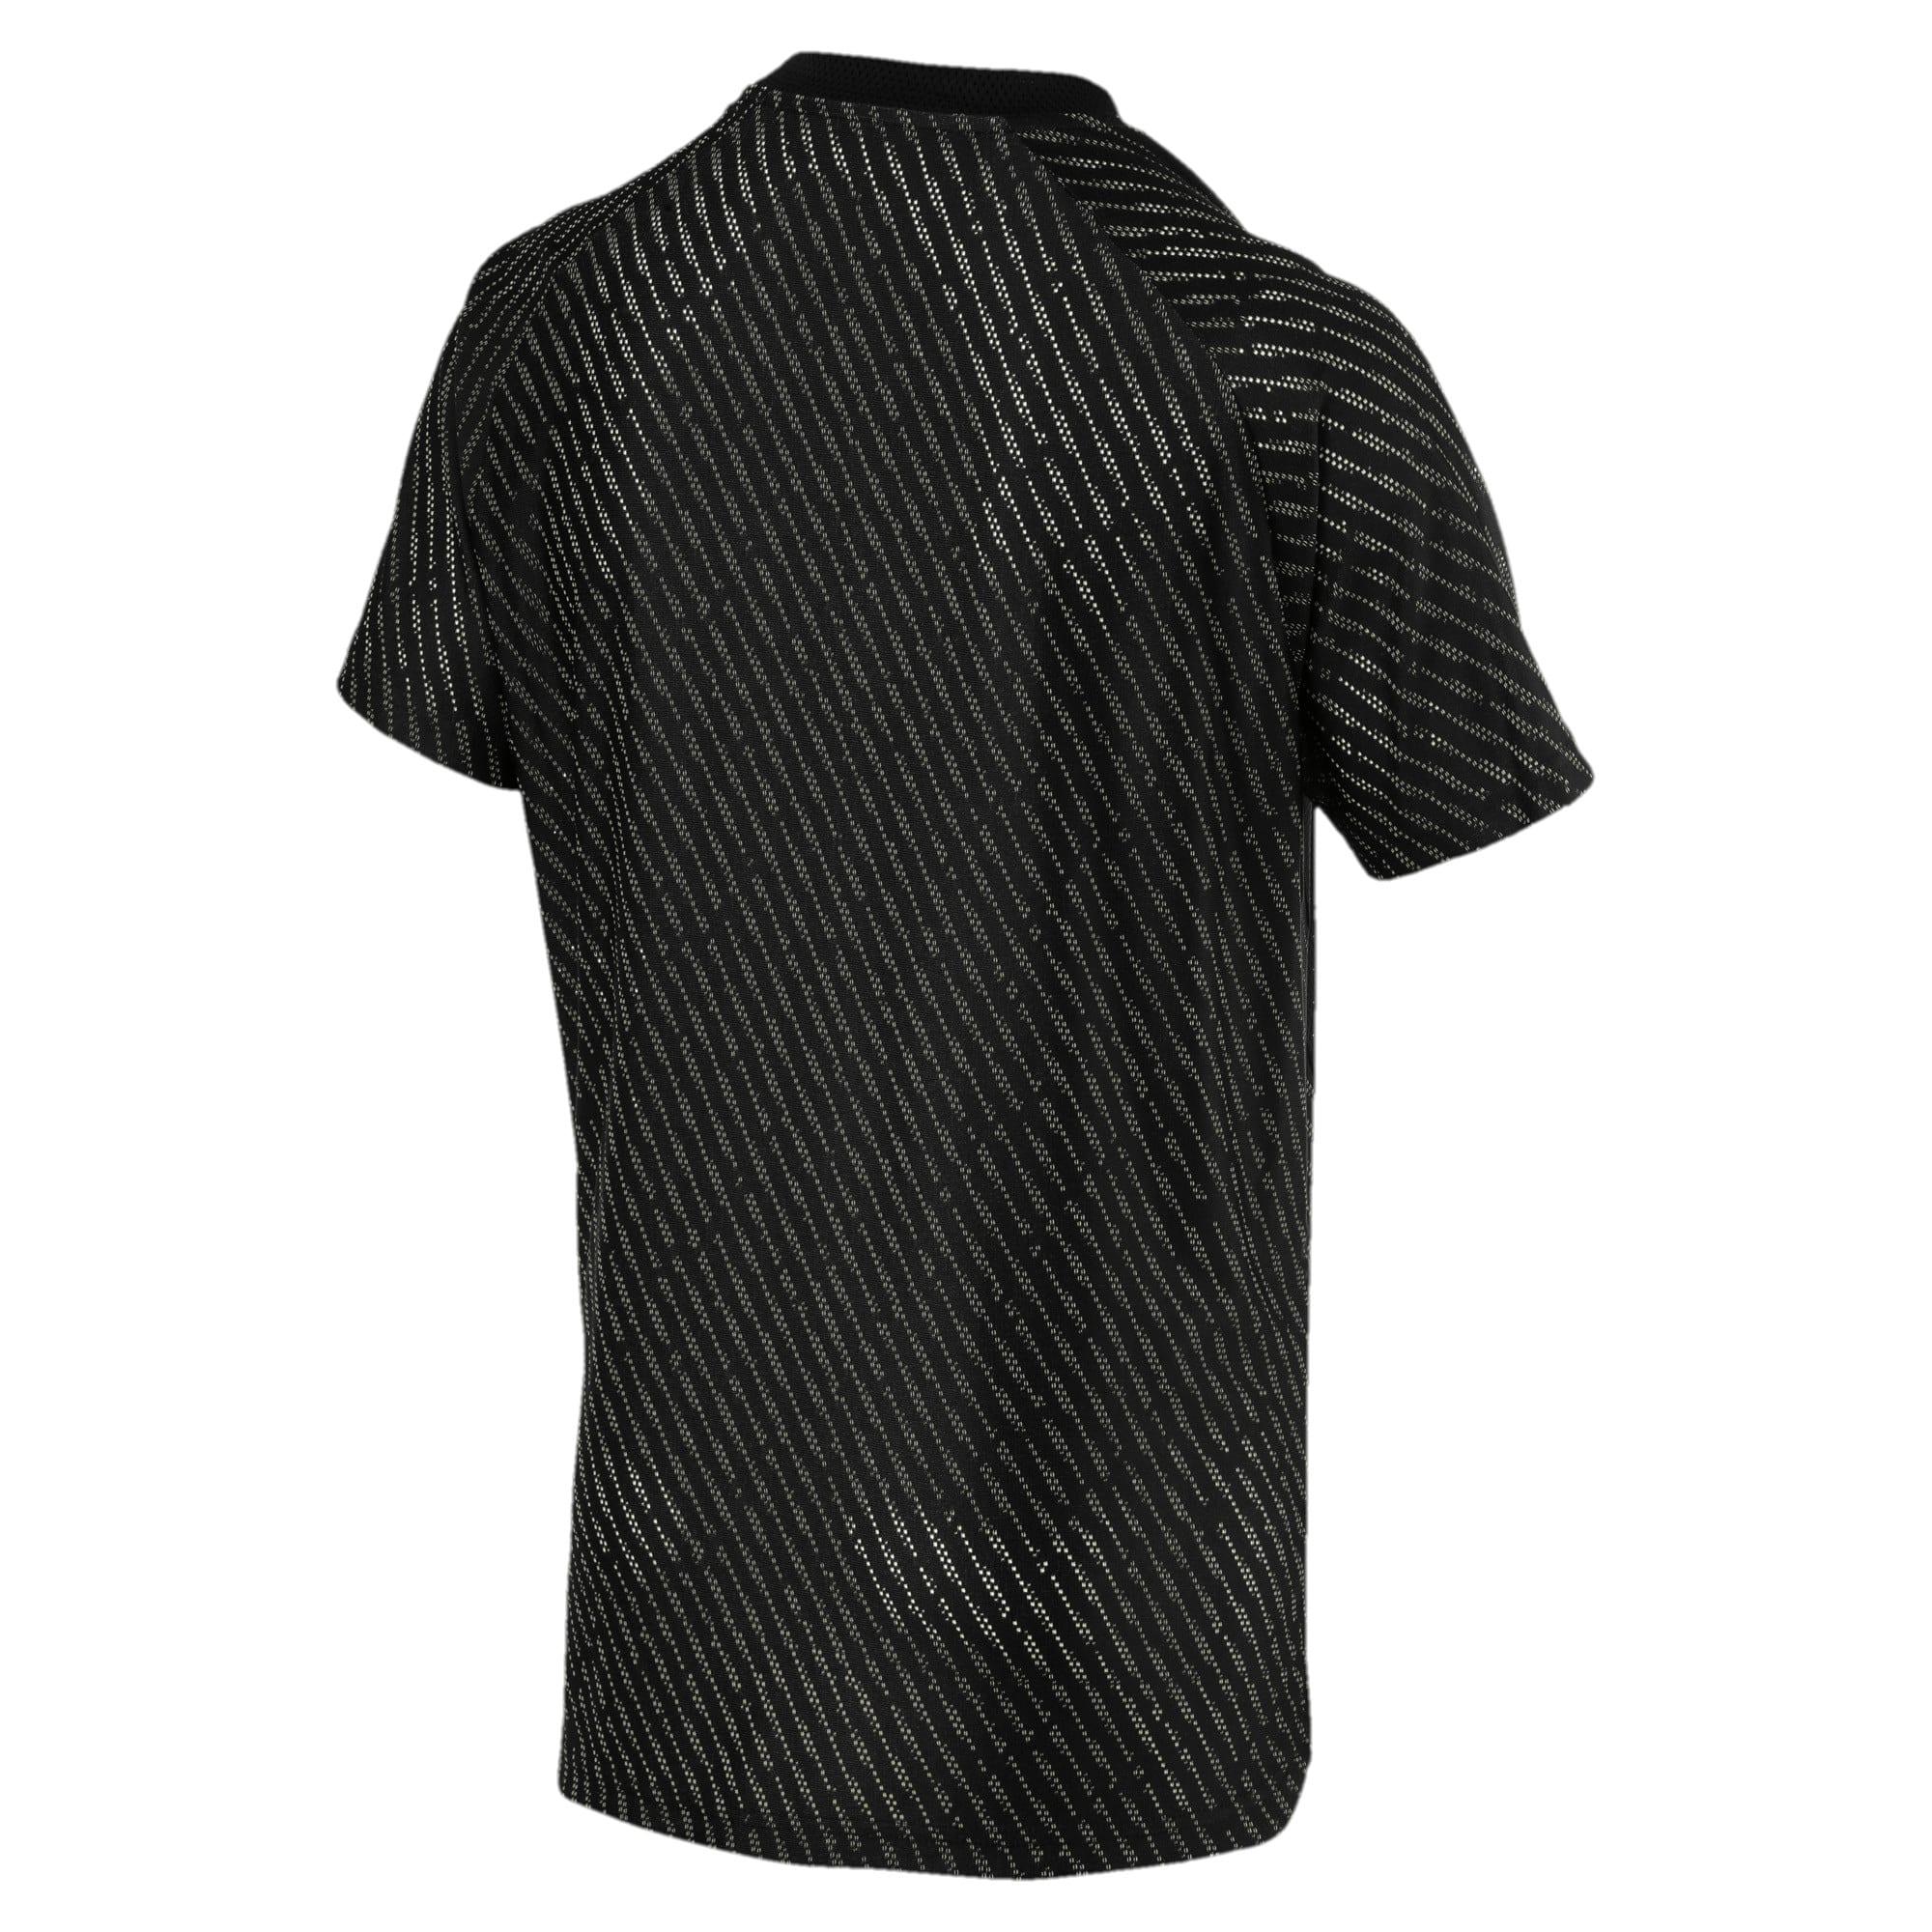 Thumbnail 5 of VENT Herren Trainingsshirt, Puma Black, medium